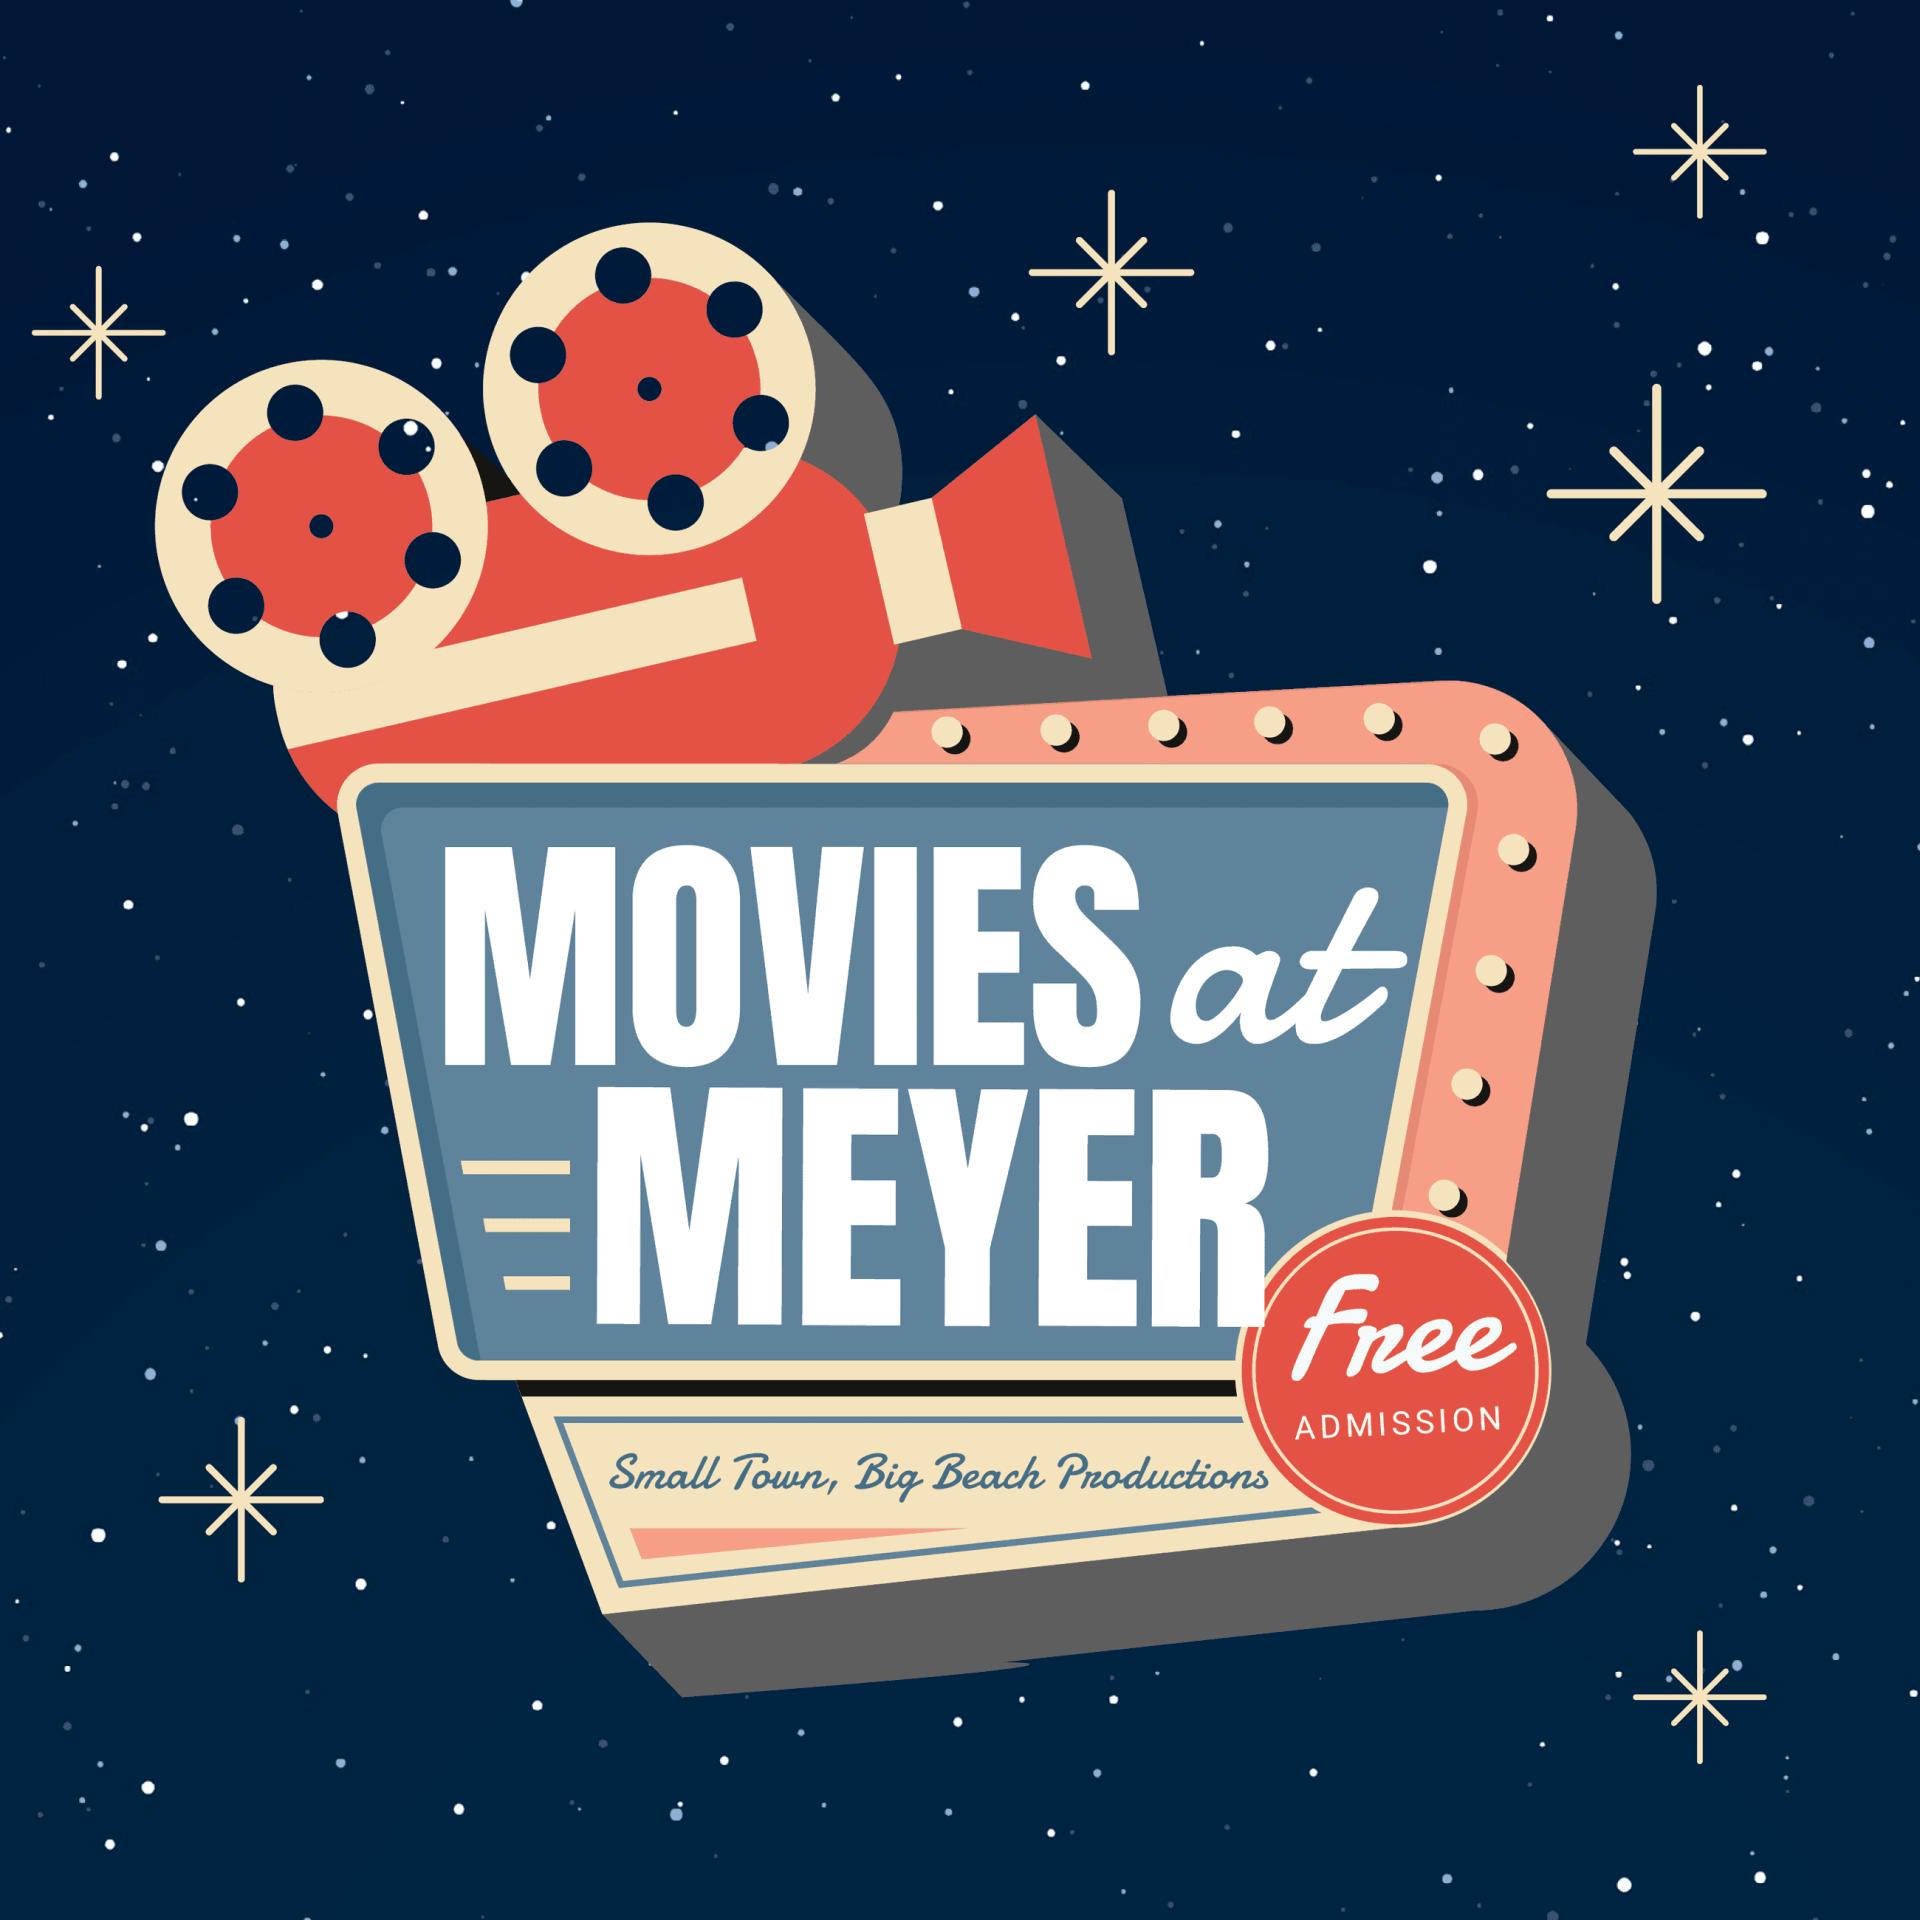 Gulf Shores announces Movies at Meyer Park beginning Oct. 21